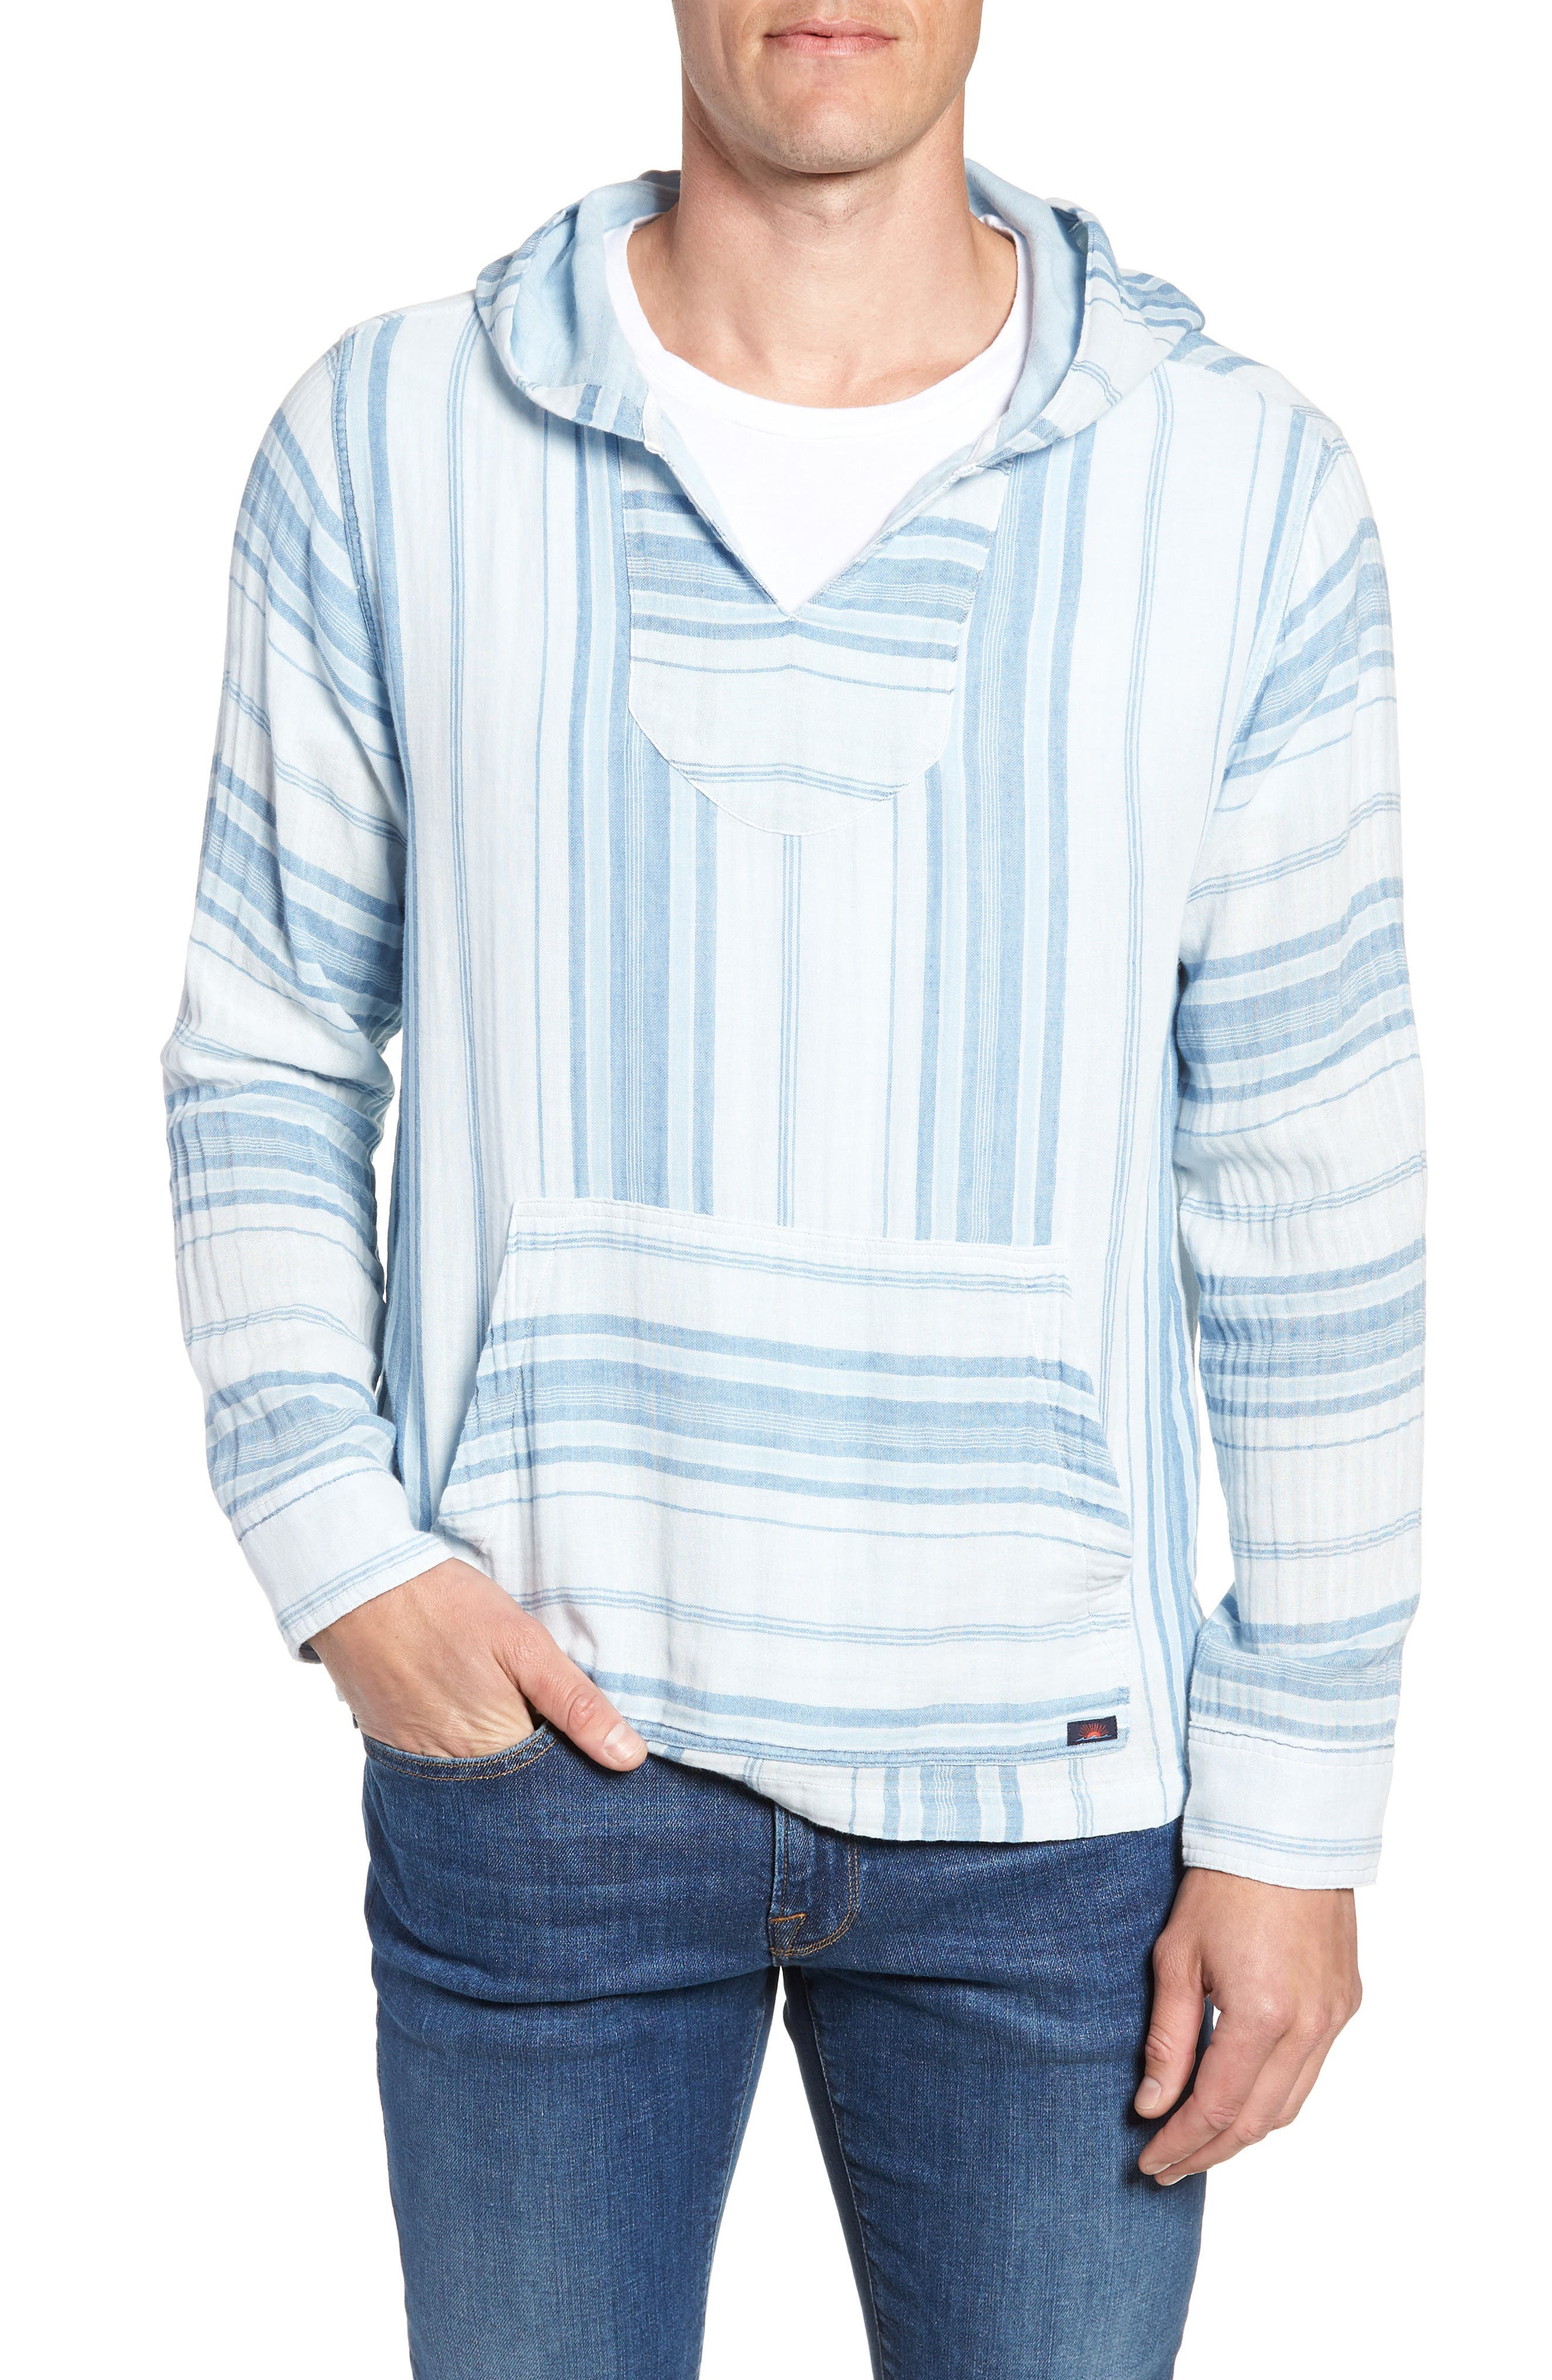 Baja Double Cloth Poncho,                             Main thumbnail 1, color,                             405